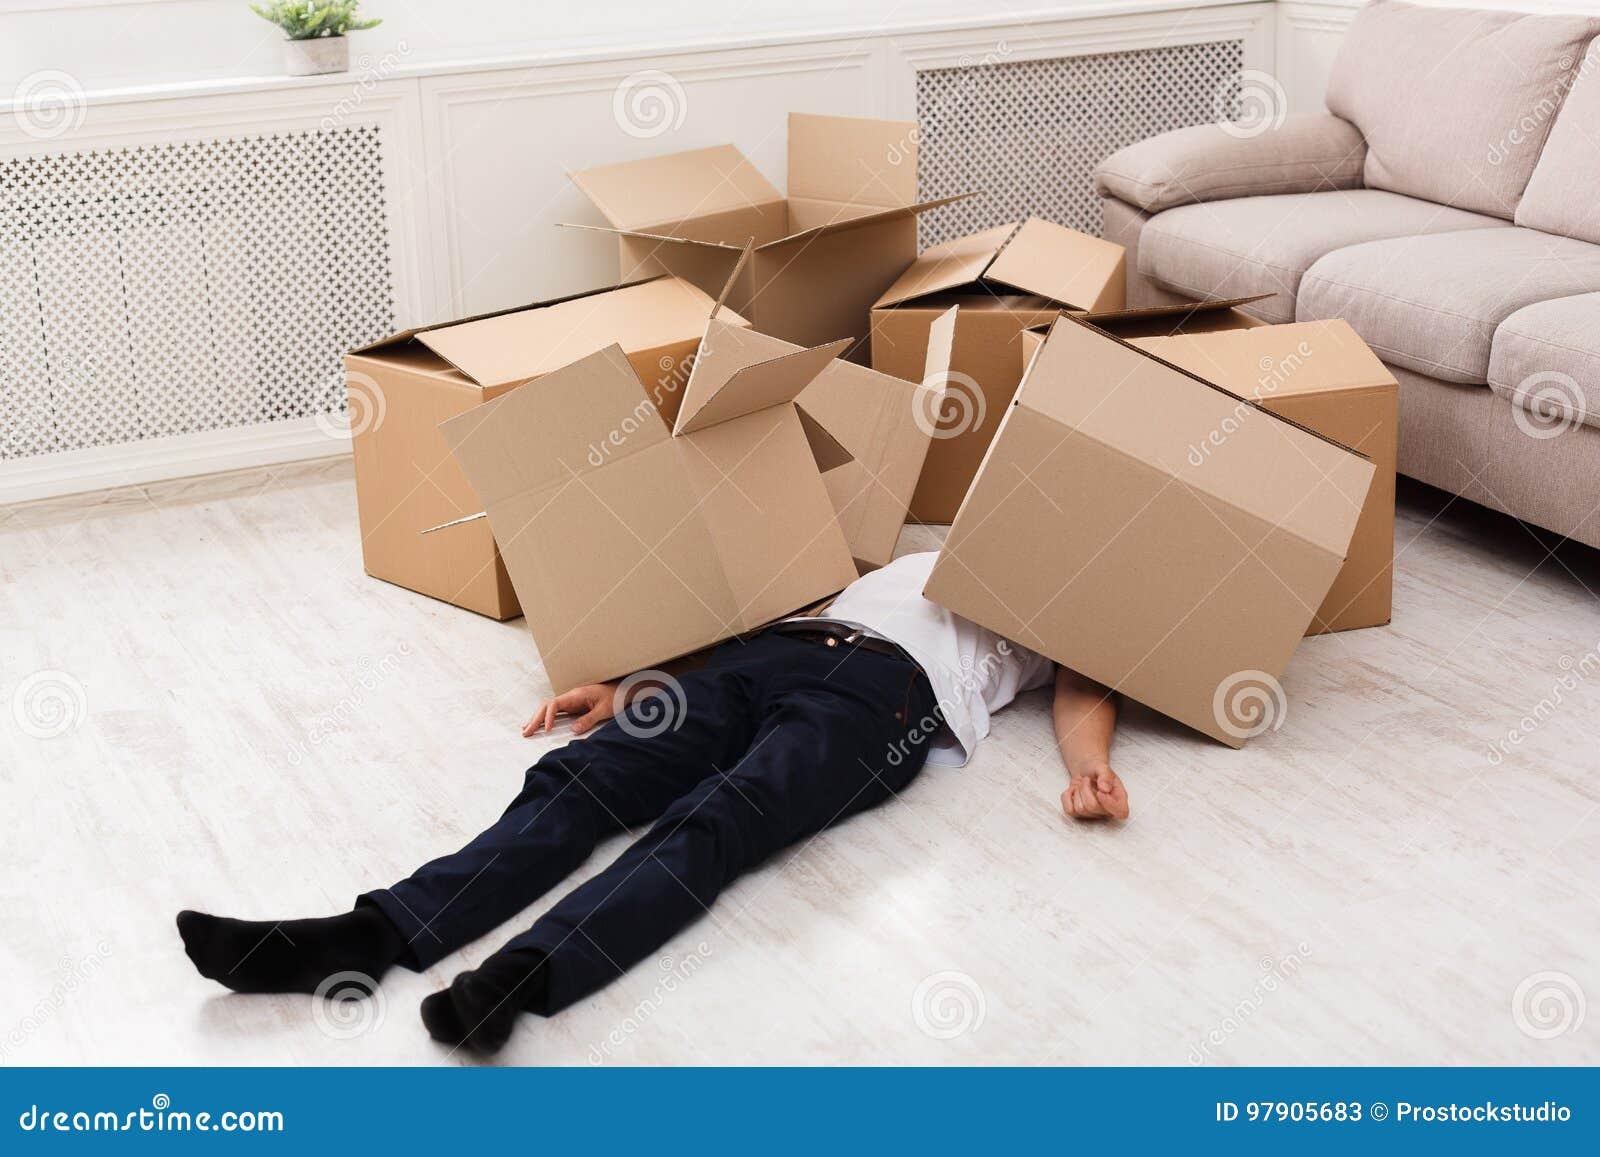 Man crushed underneath cardboard boxes